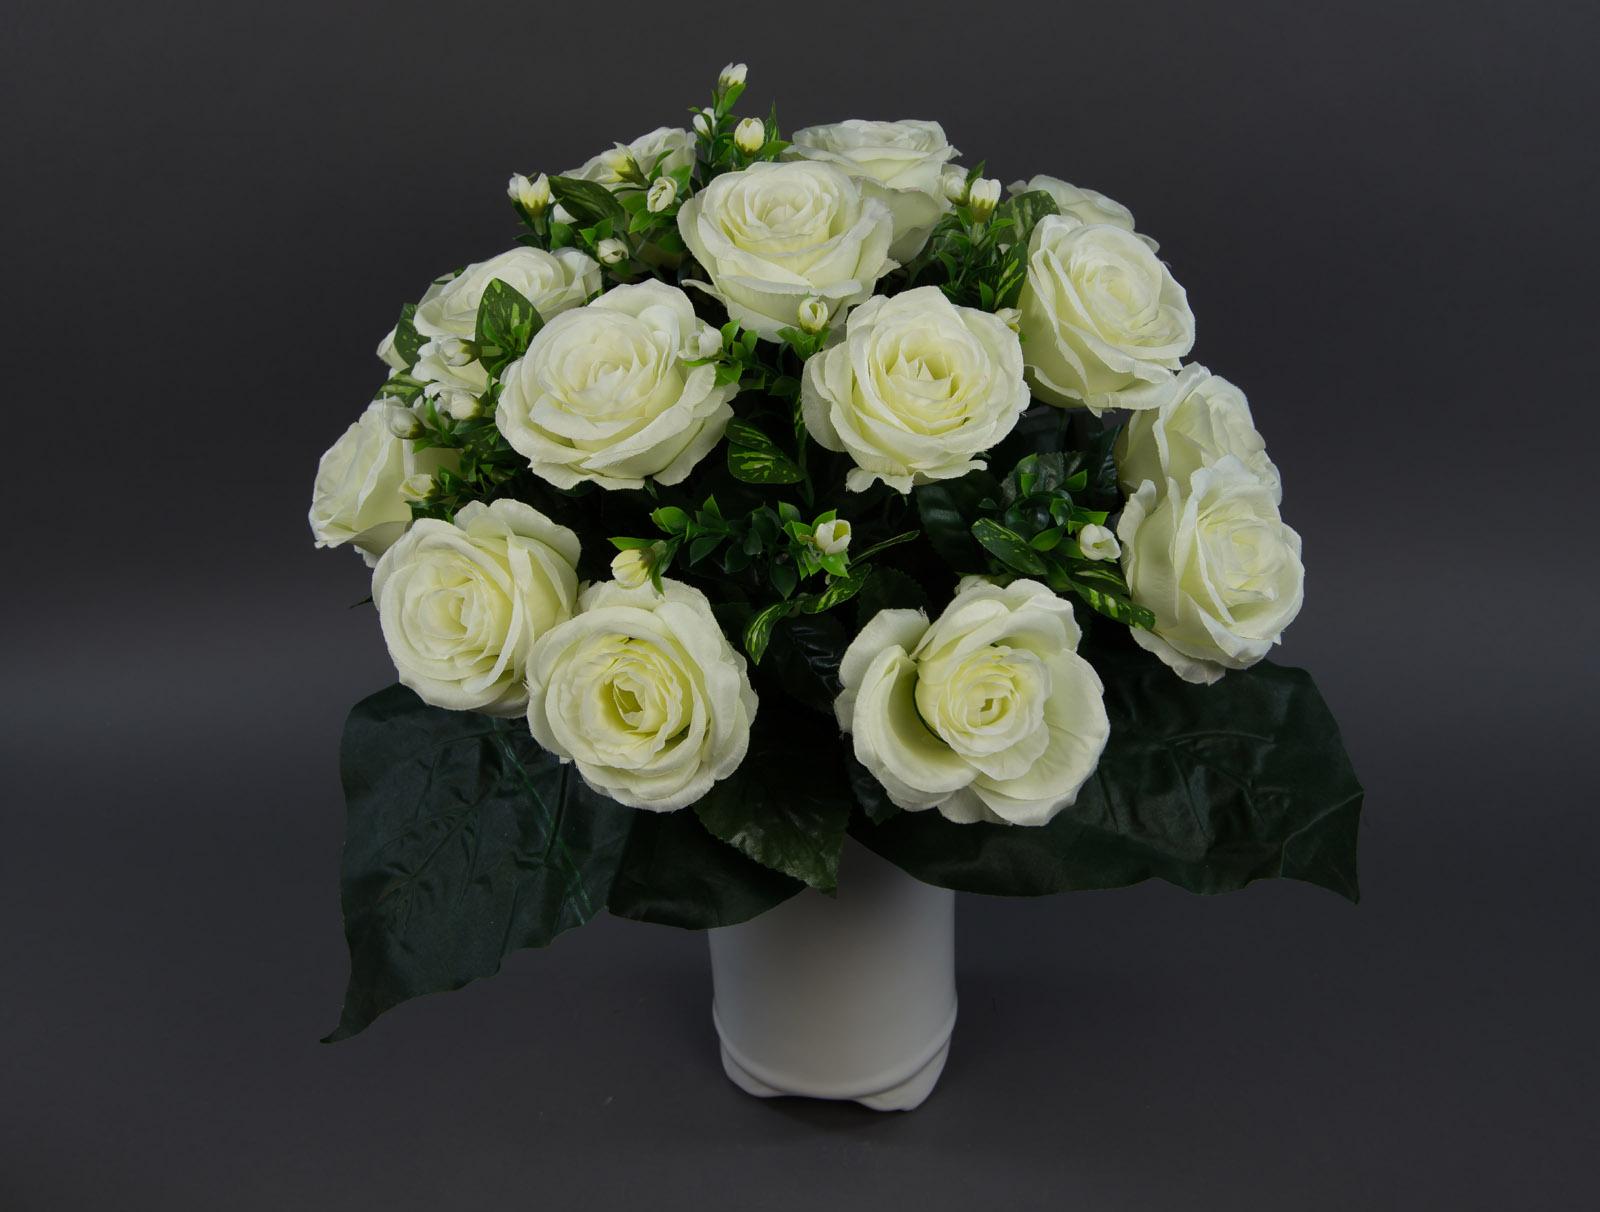 gro er rosenstrau 45x45cm wei creme lm seidenblume k nstliche rose kunstblumen ebay. Black Bedroom Furniture Sets. Home Design Ideas